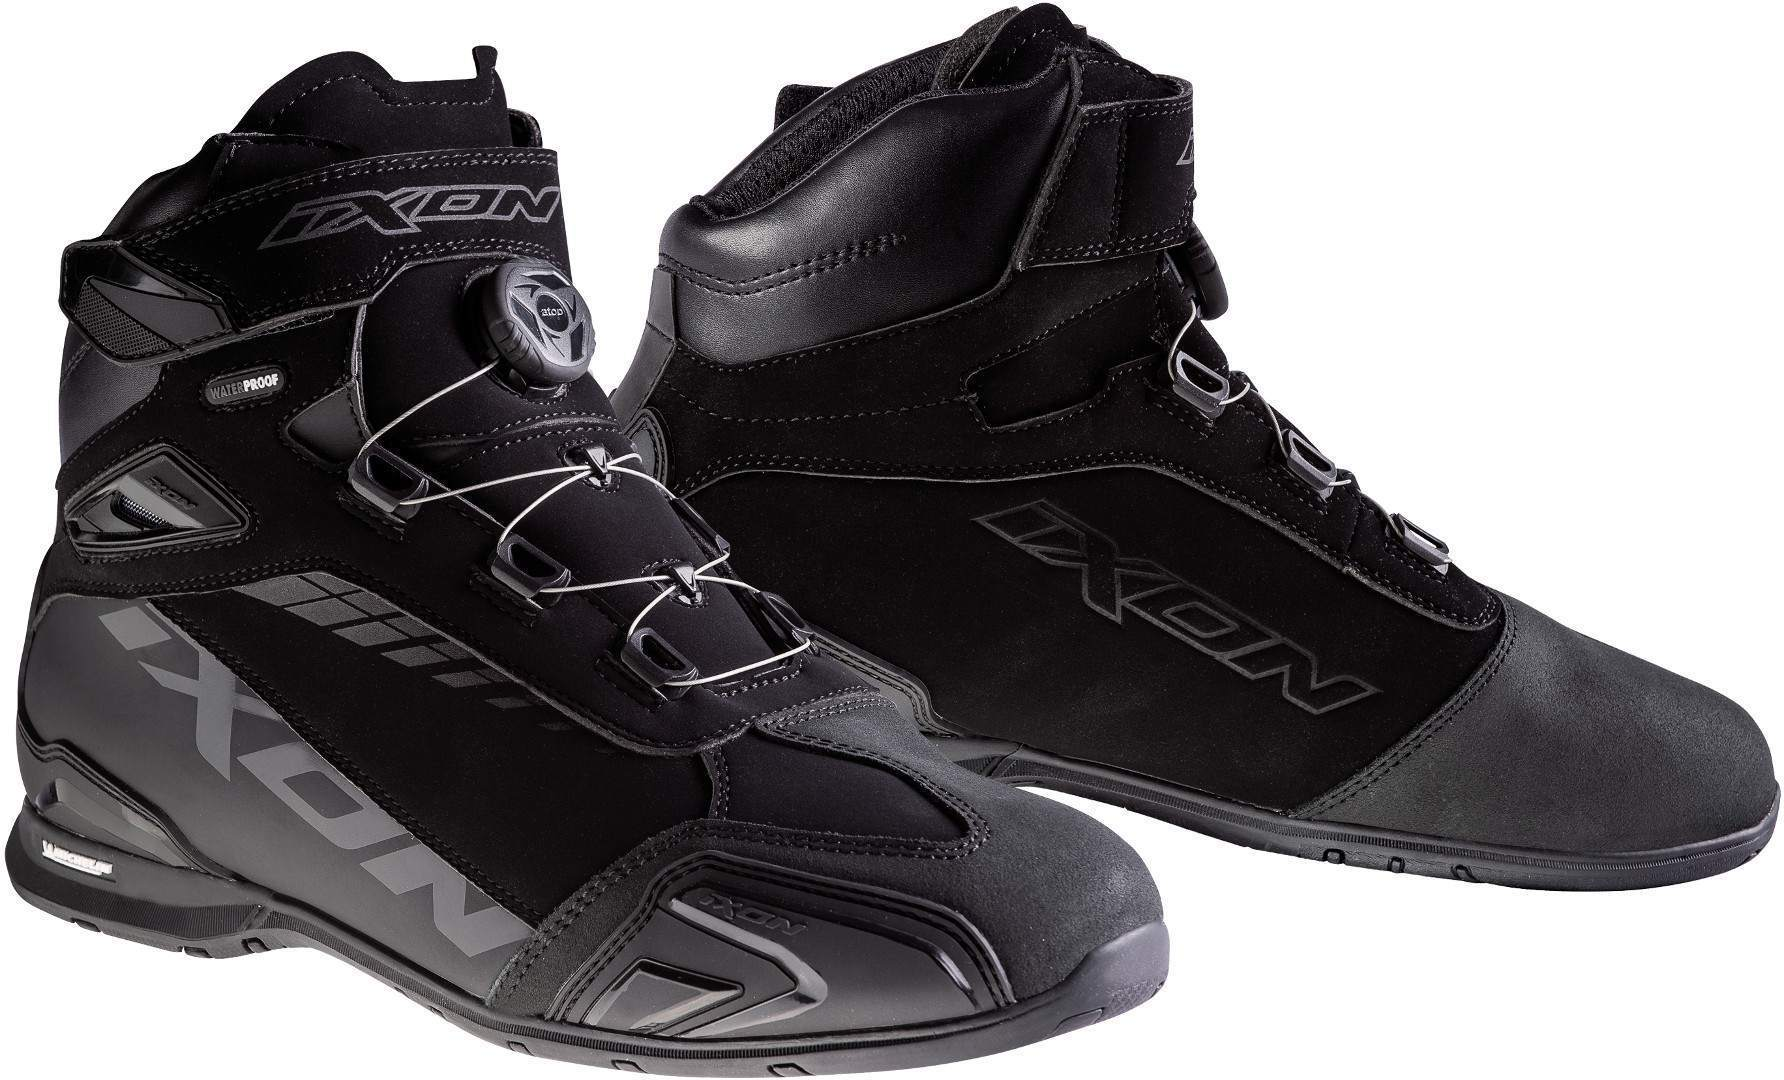 Ixon Bull WP Motorradschuhe, schwarz, Größe 41, schwarz, Größe 41